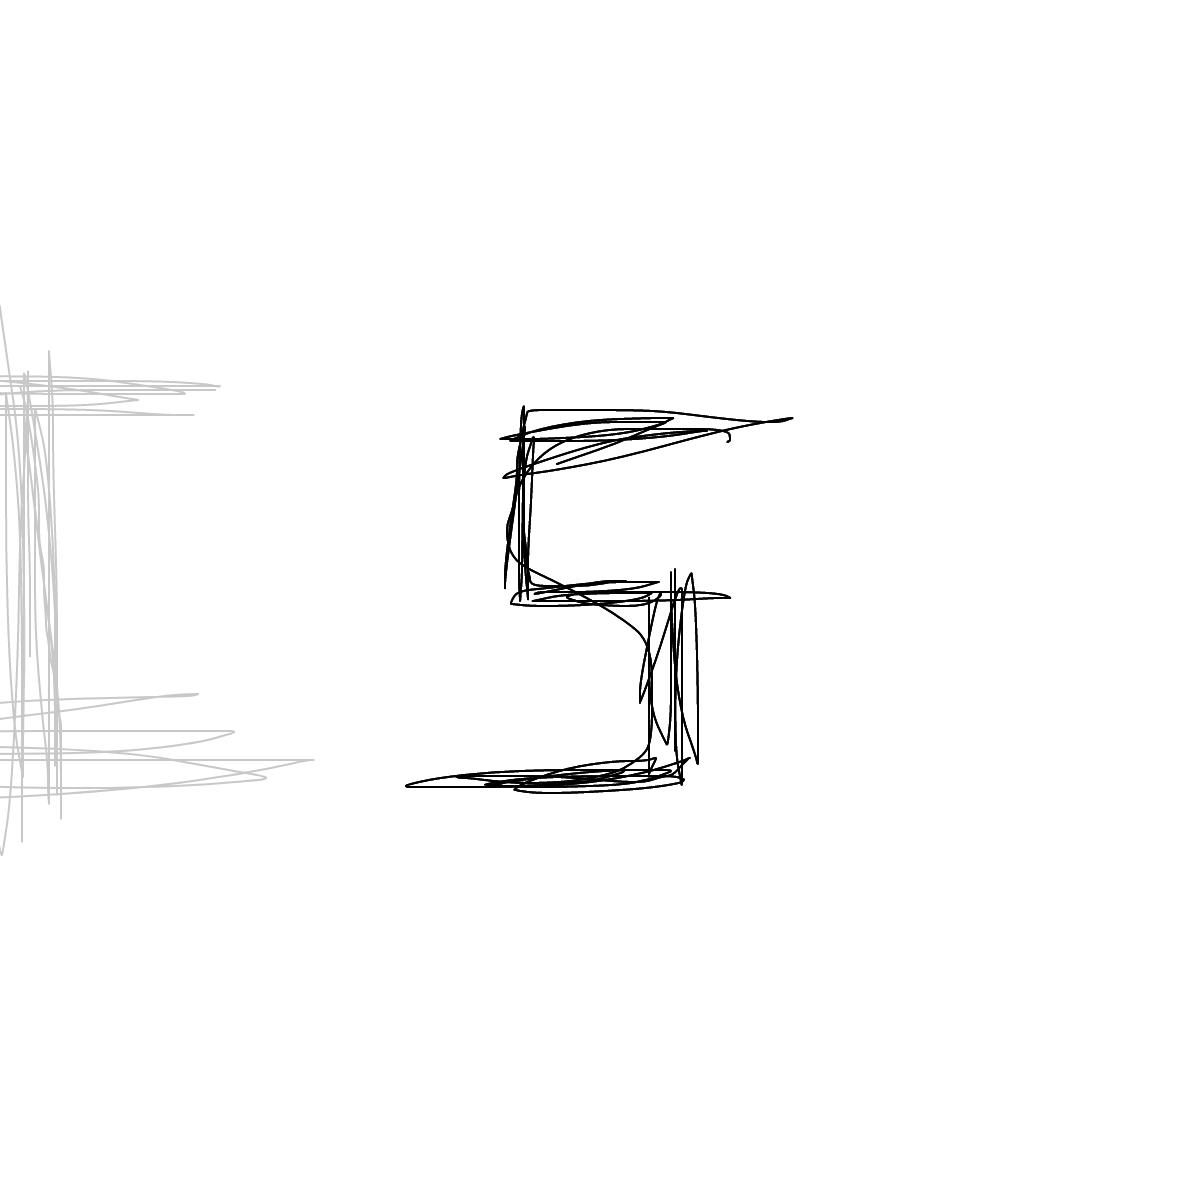 BAAAM drawing#23428 lat:77.0888748168945300lng: 156.5493927001953000